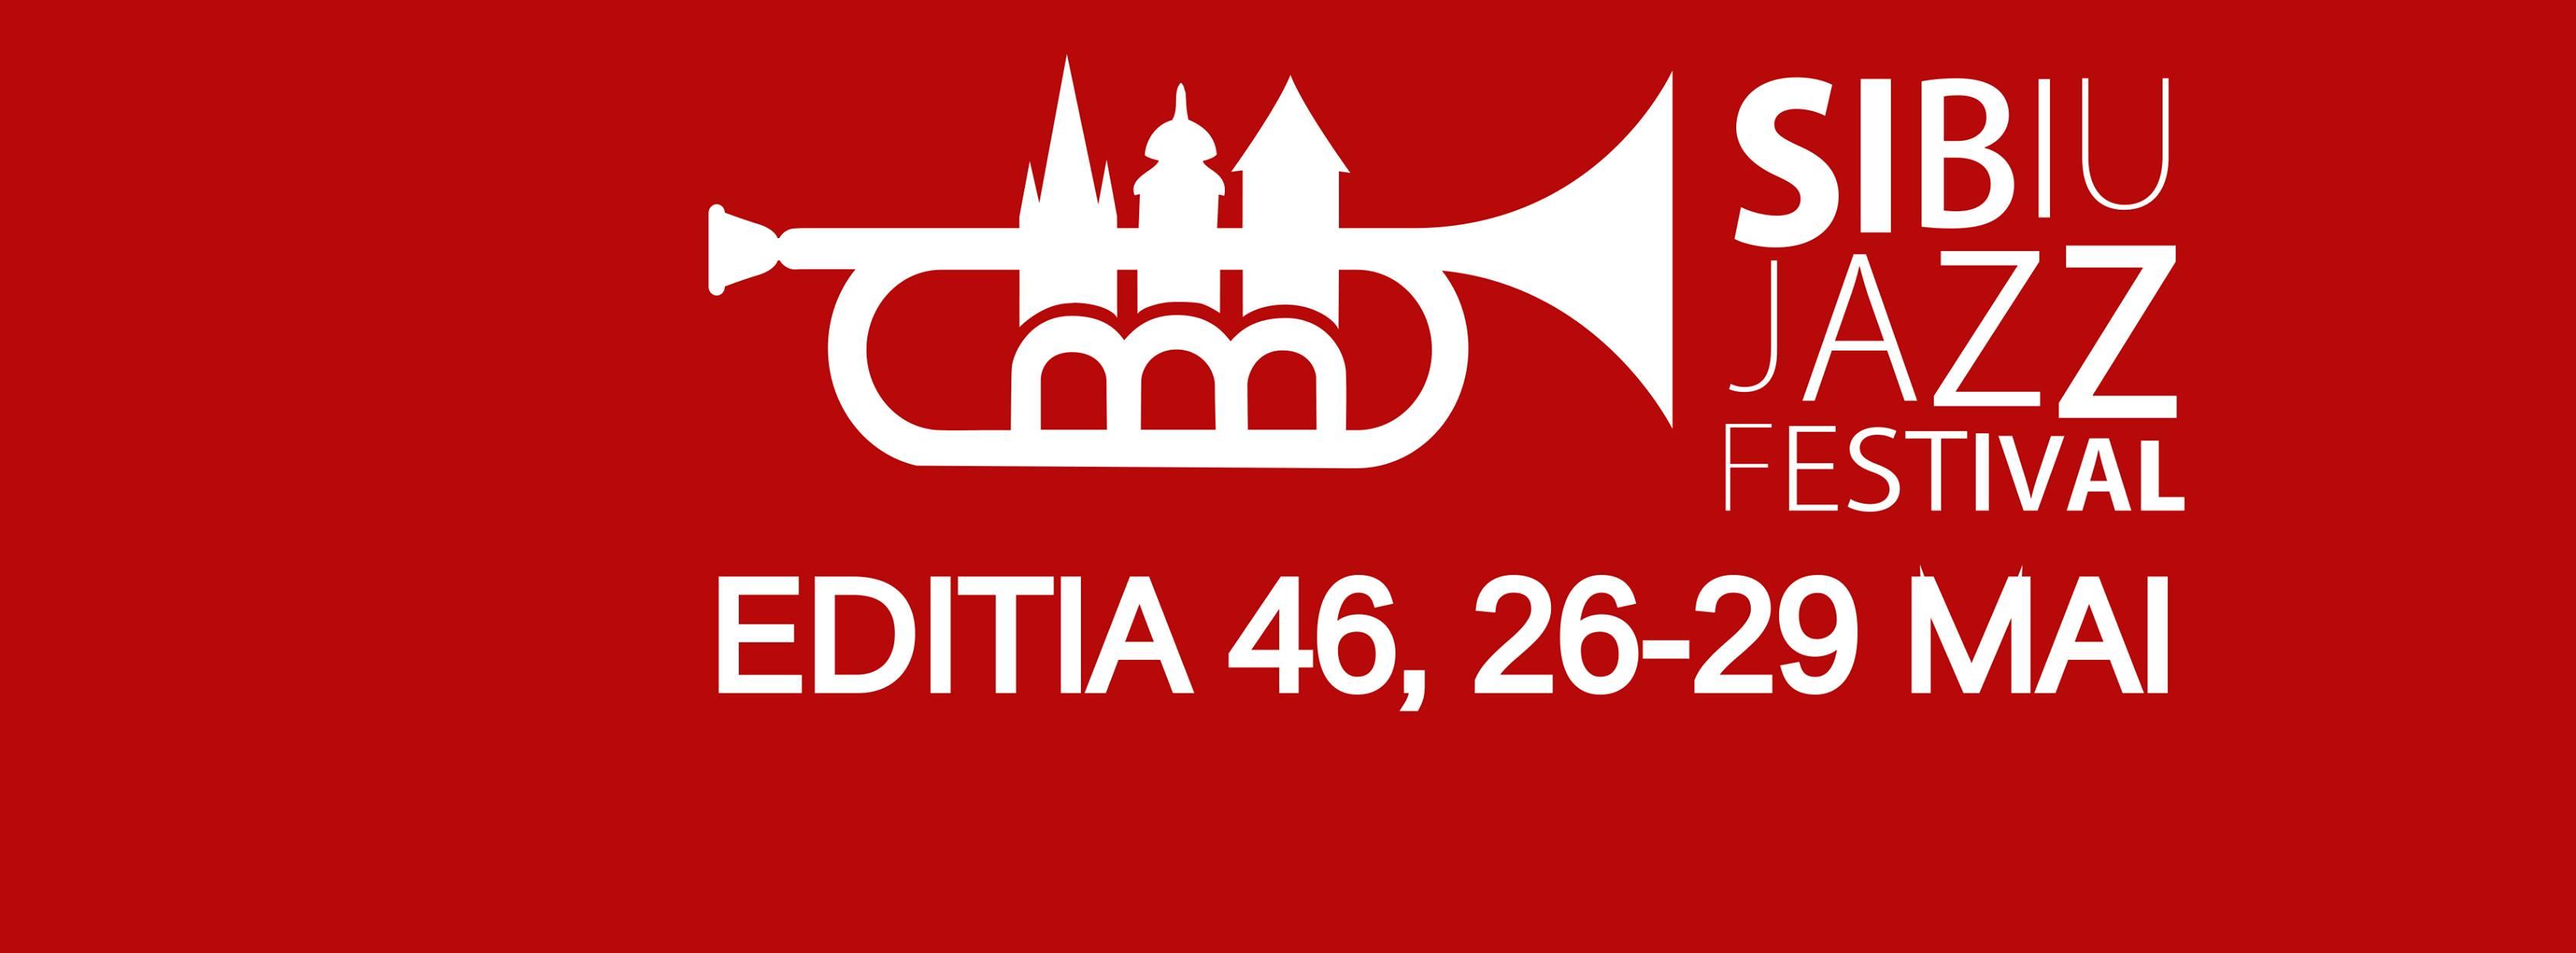 Sibiu Jazz Festival - Editia 46